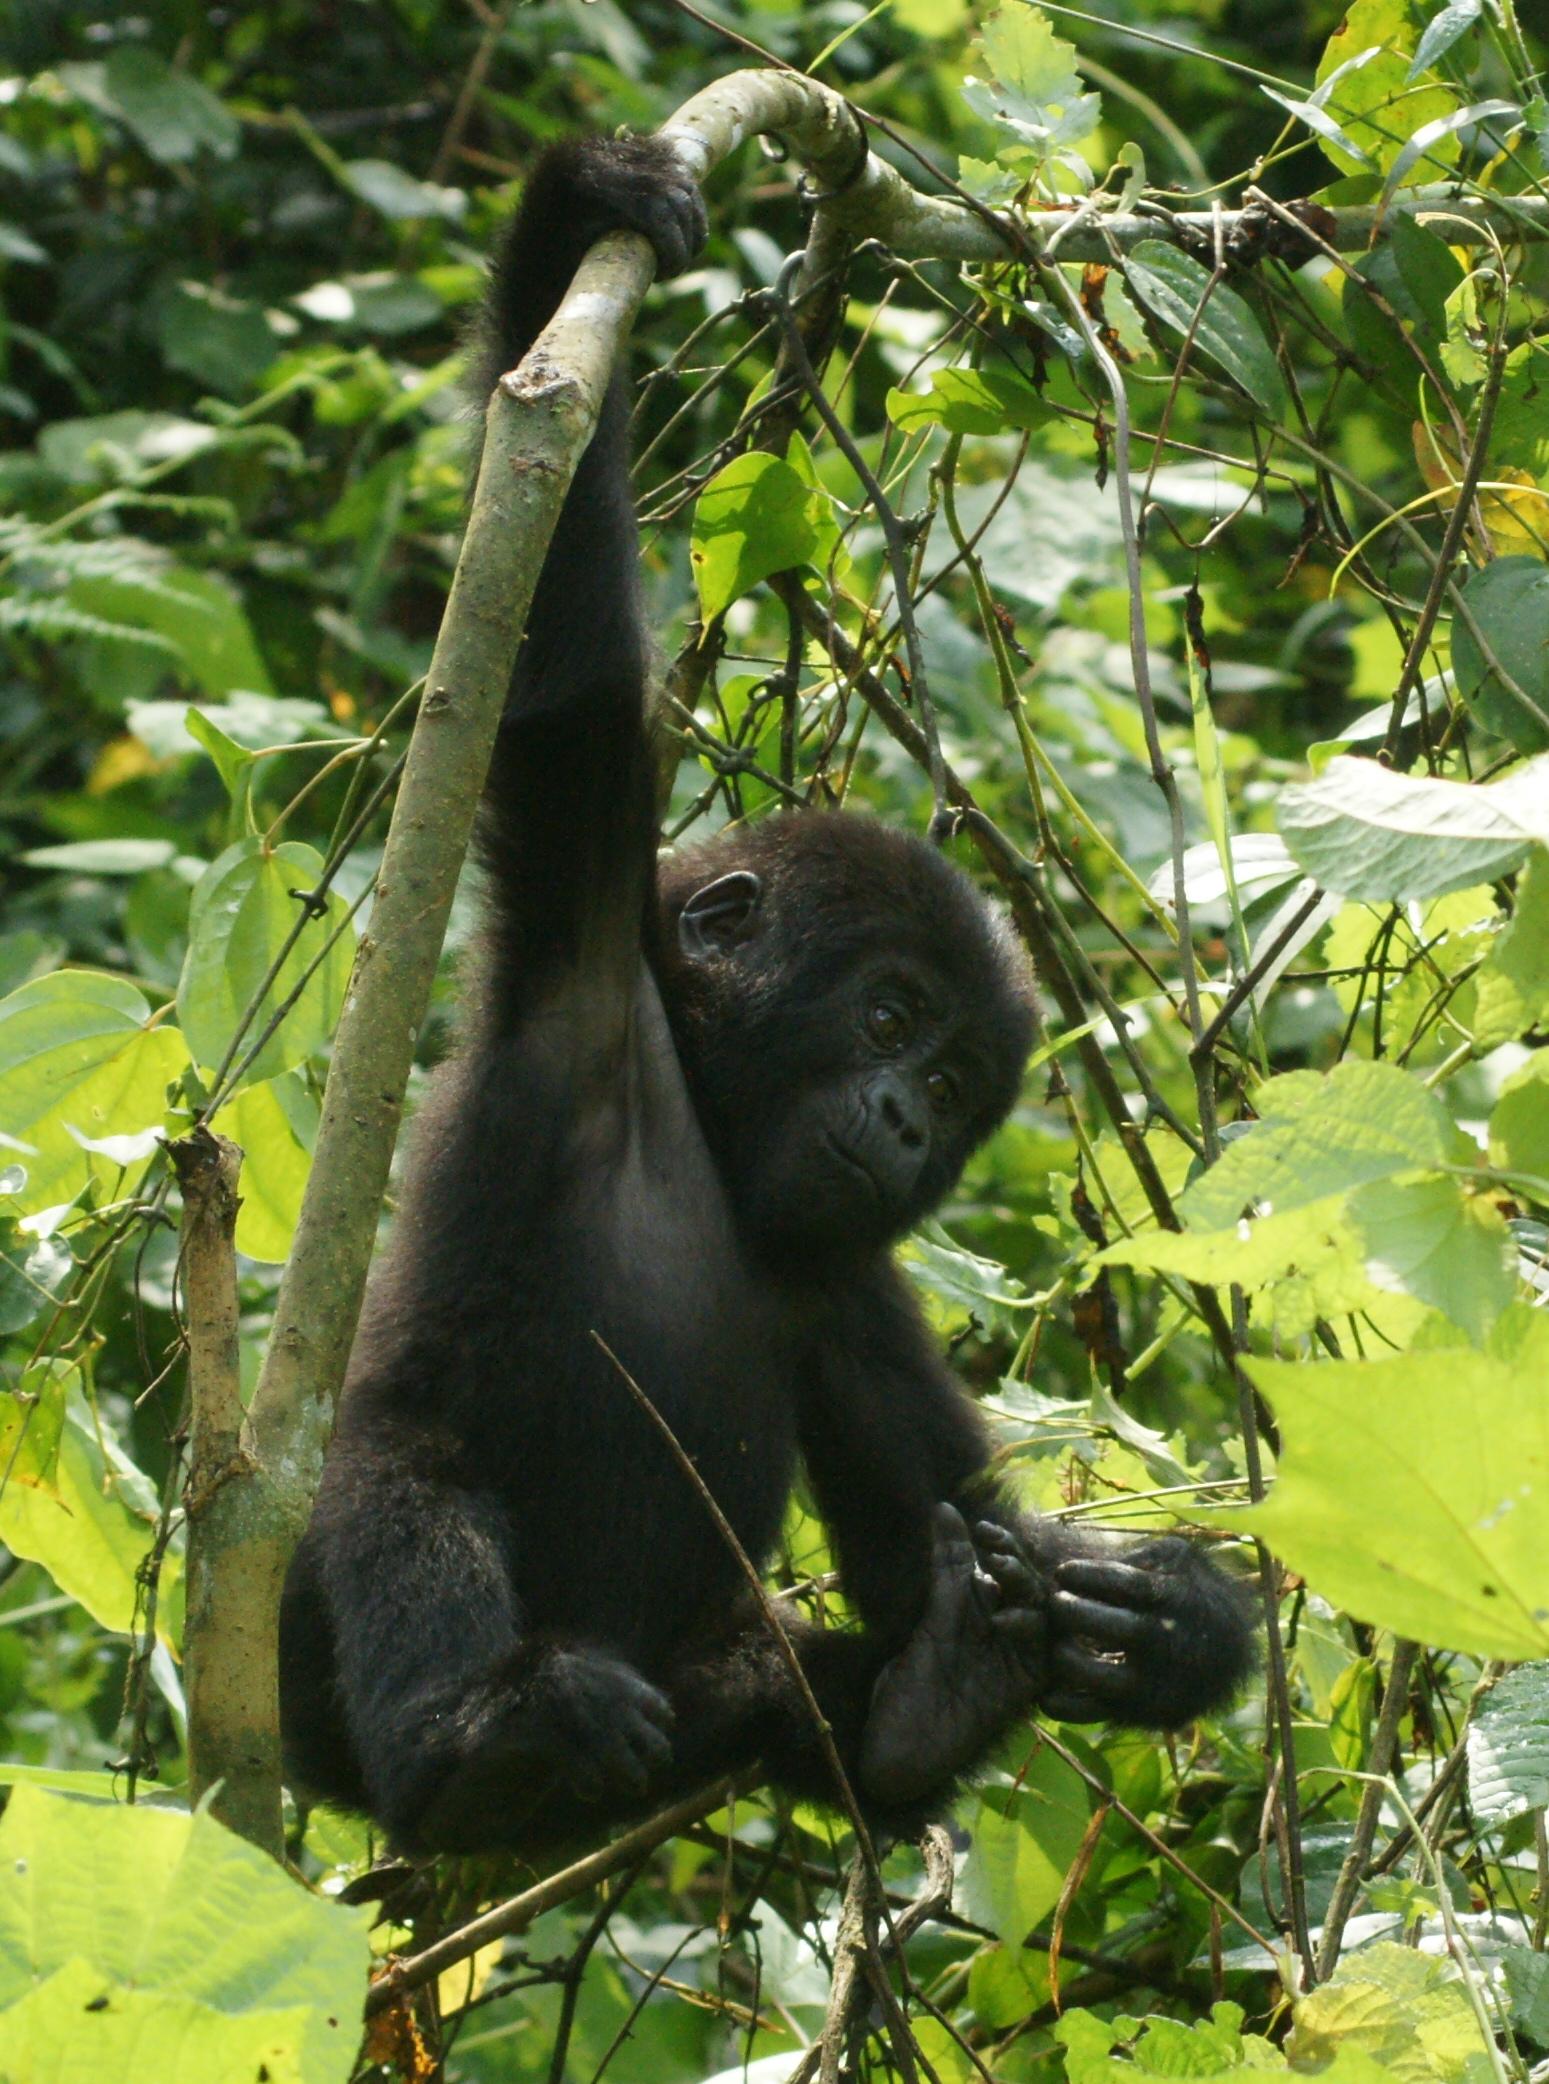 Swinging ape jpg